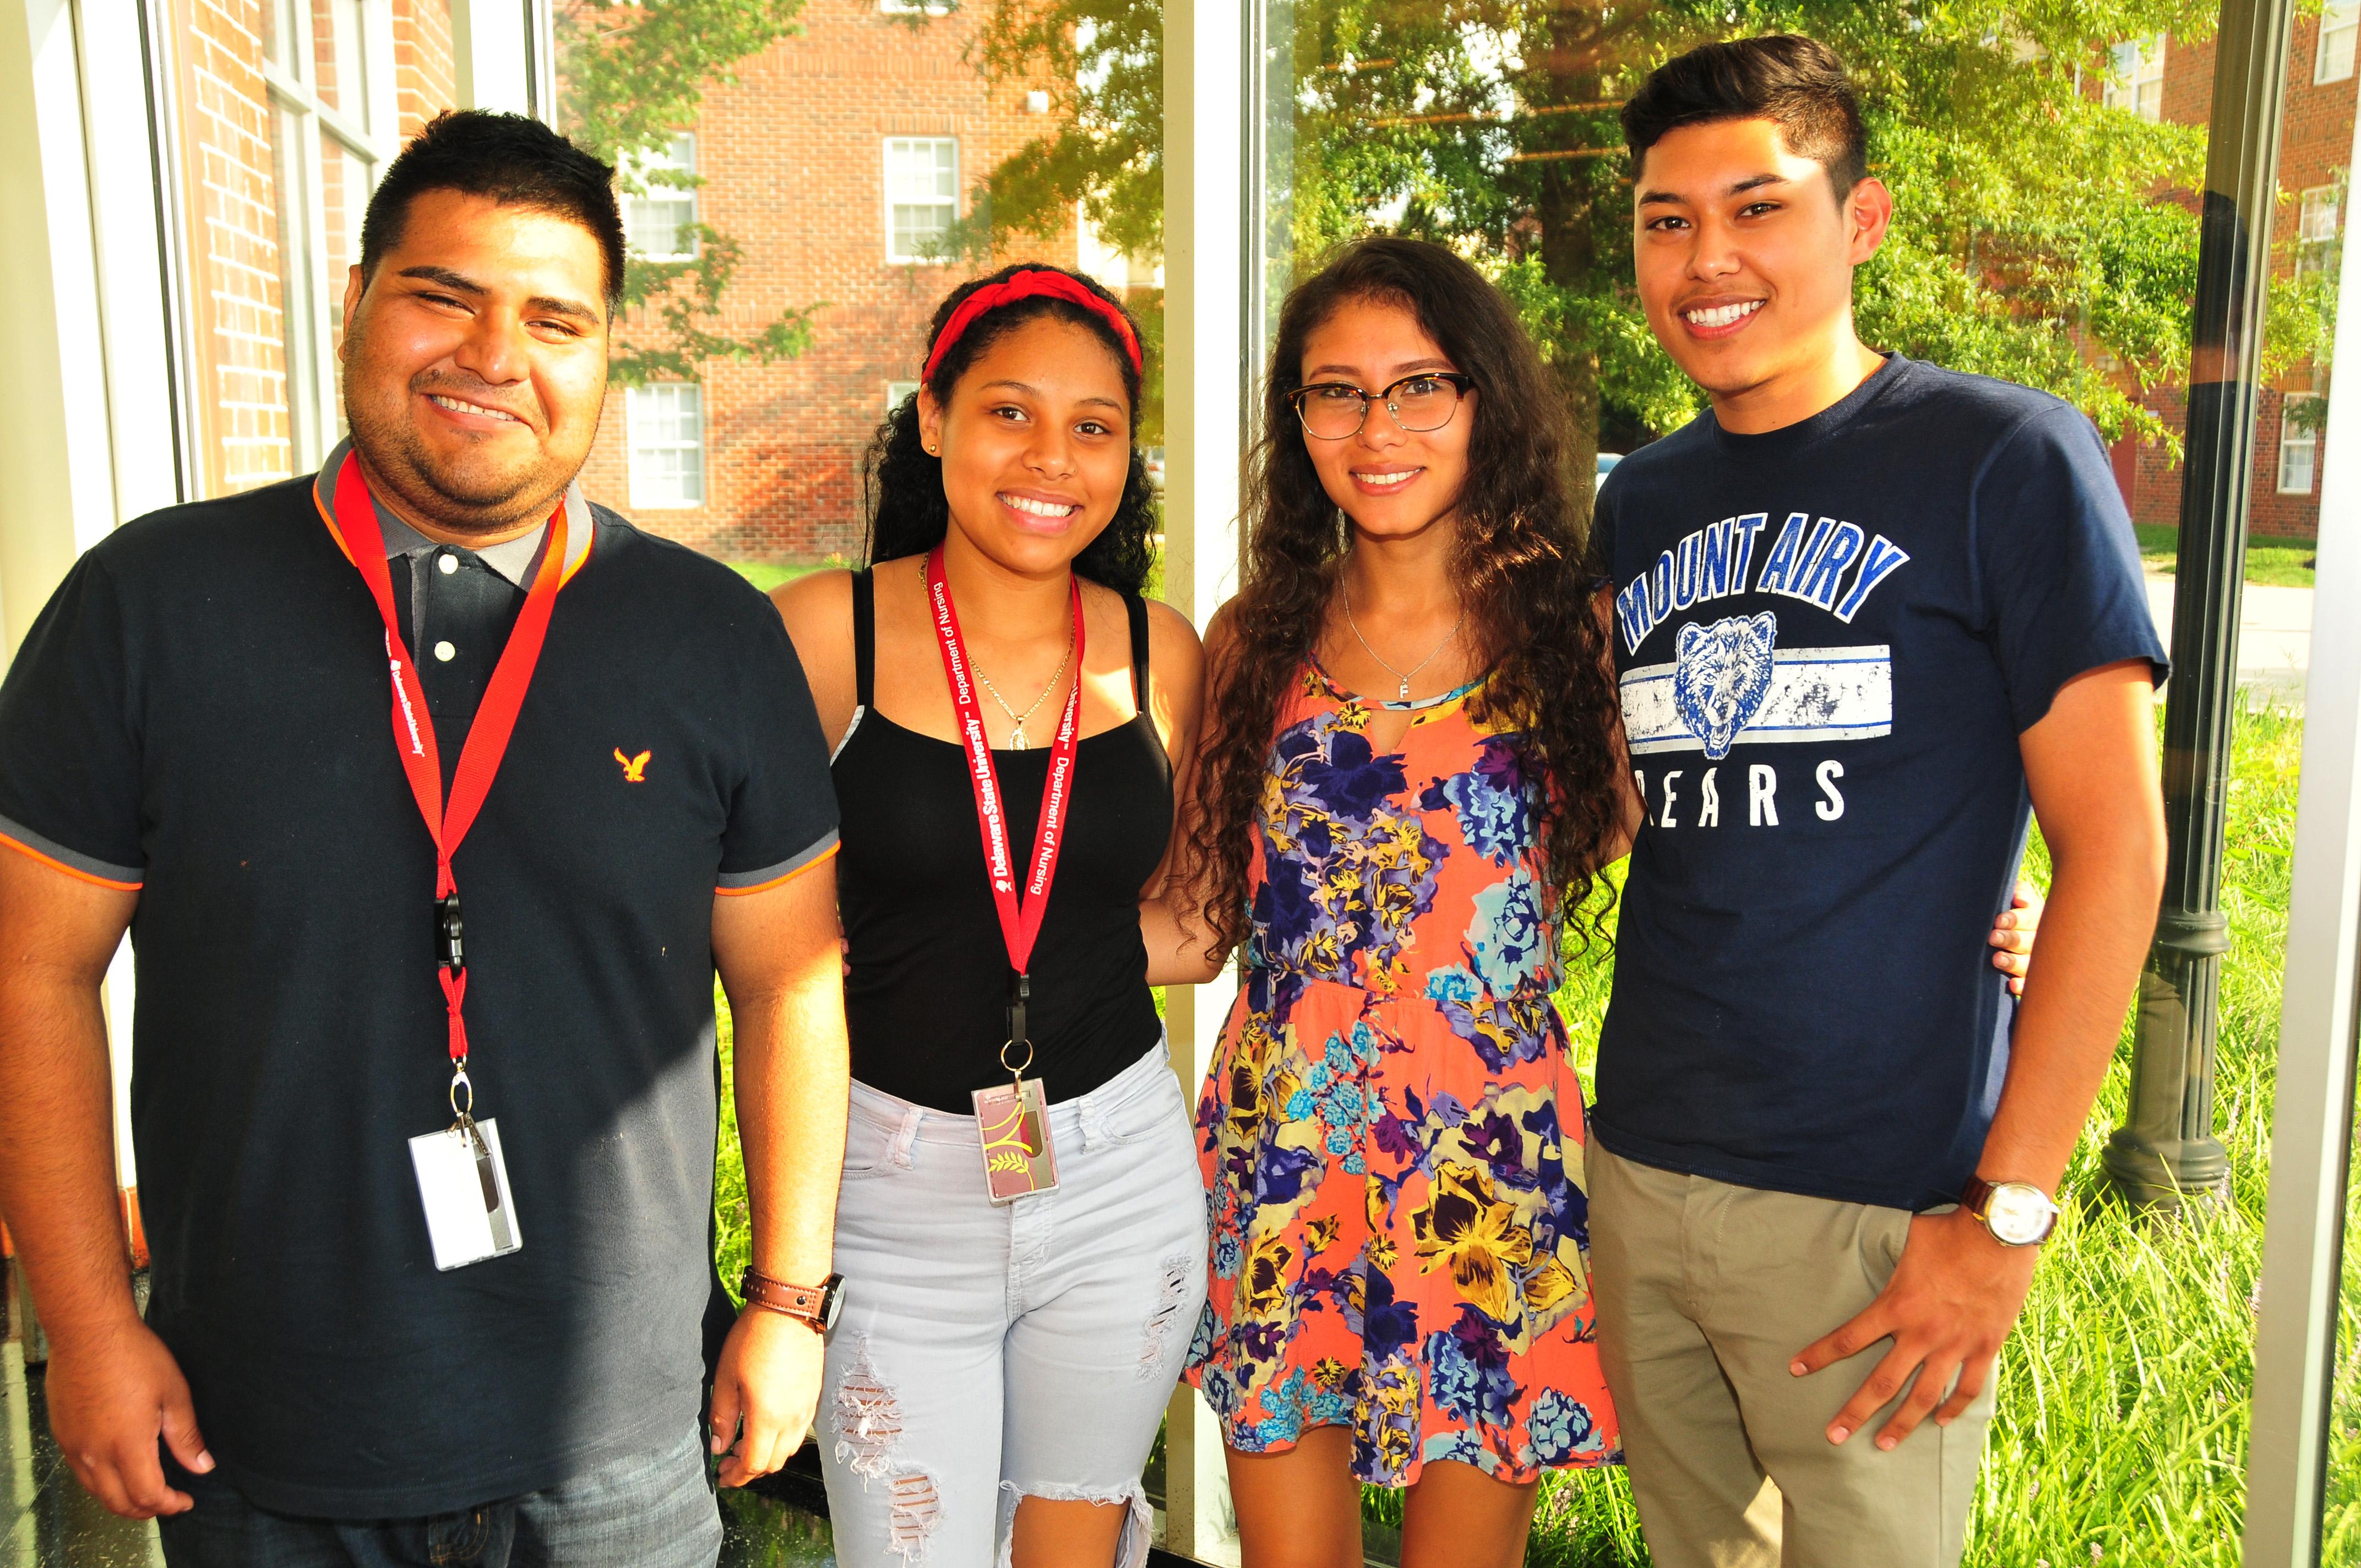 (L-r) Sergio Ramirez, Itzel Serrano, Maria Fernanda Lima and Dilan Lozano are all academic high achievers.